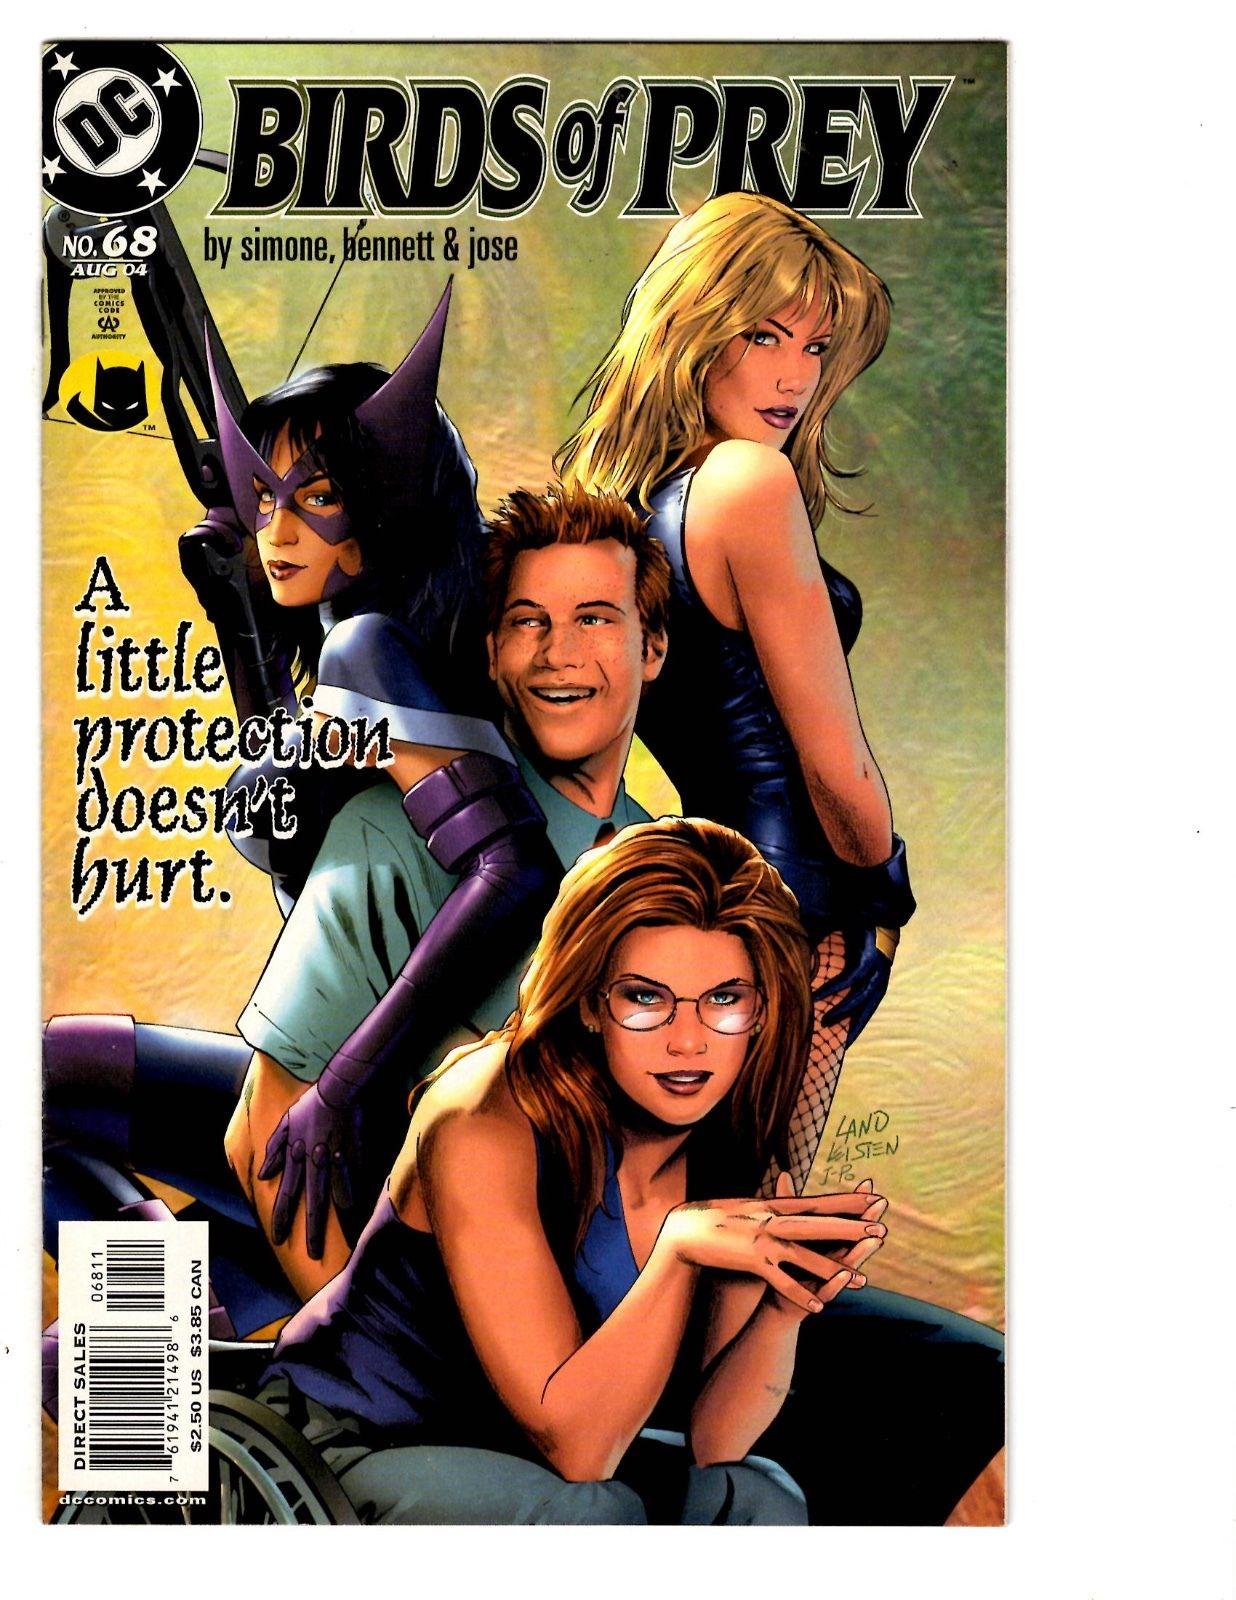 5 Birds Of Prey Dc Comics 68 69 70 71 72 Oracle Black Canary Huntress Bh17 Hipcomic